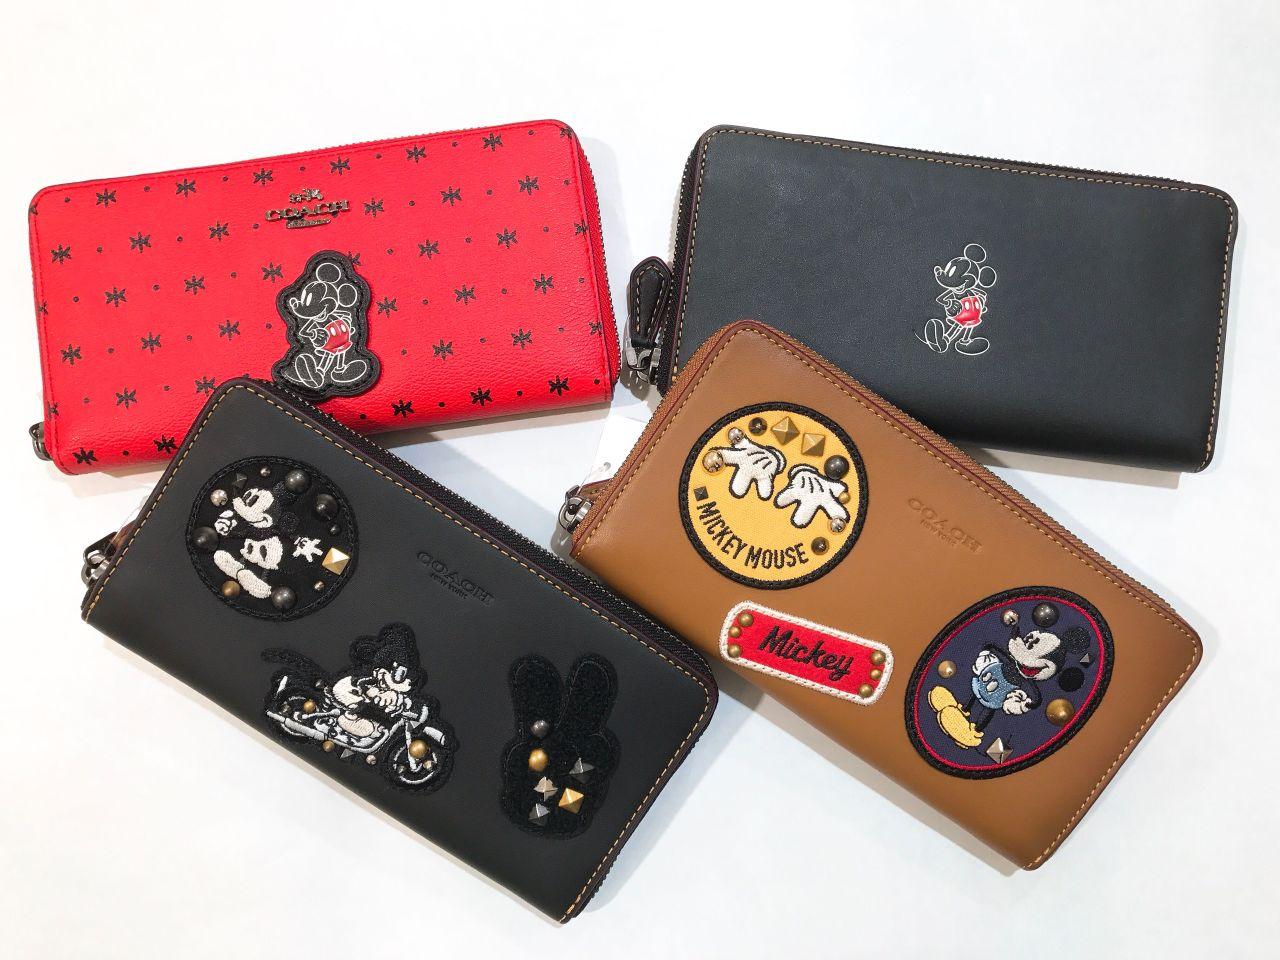 big sale f85c0 05ece ☆COACH(コーチ)×ディズニーのコラボ財布☆ | 東海店 | フィット ...